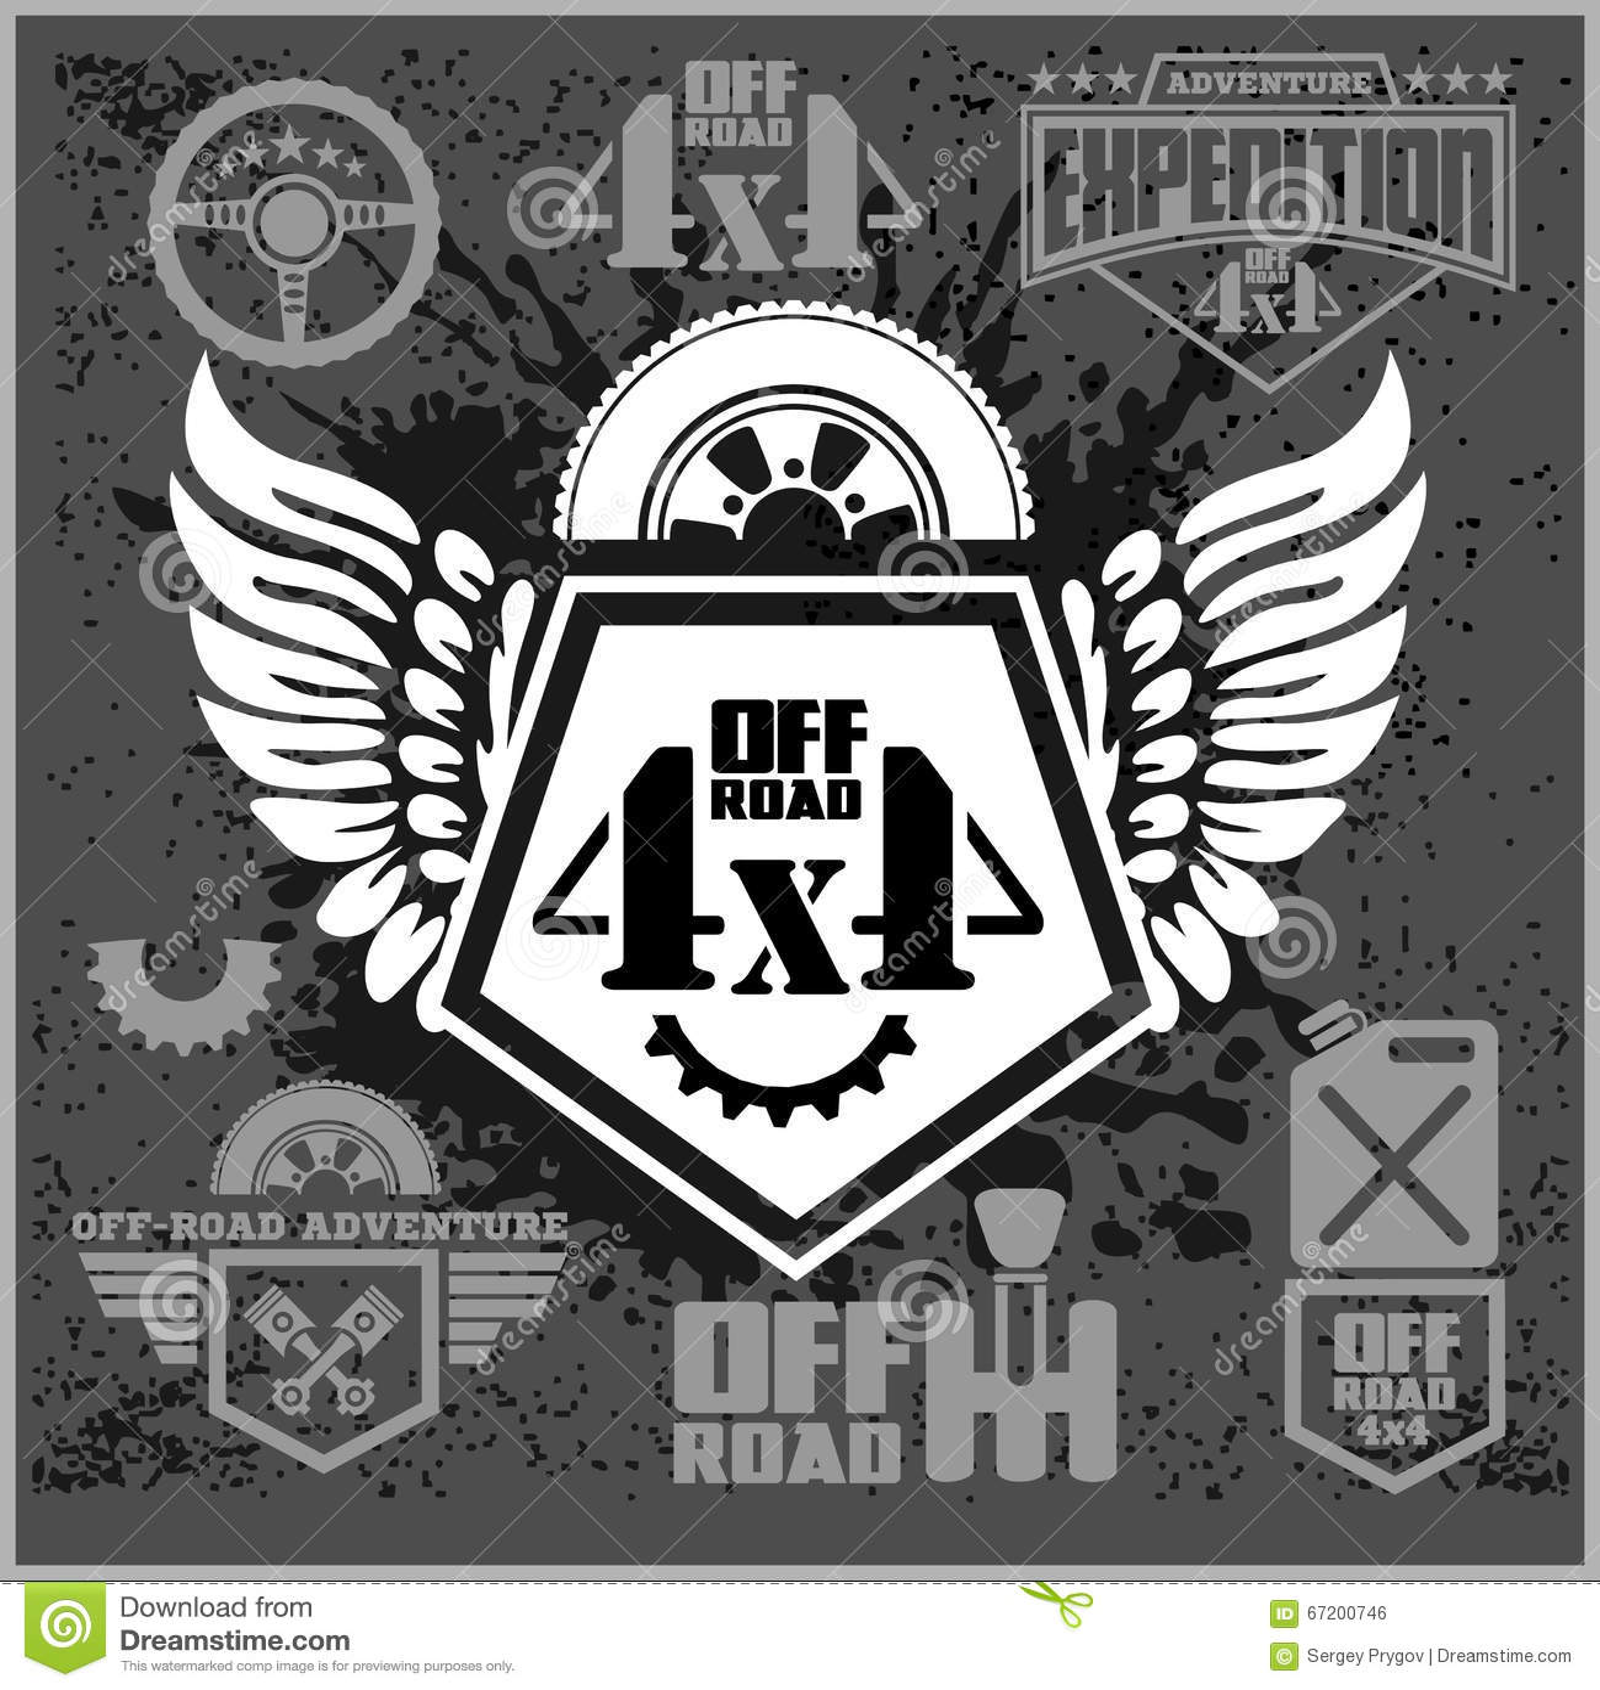 Design car emblem - 4x4 Car Design Road Suv Automotive Extreme Emblem